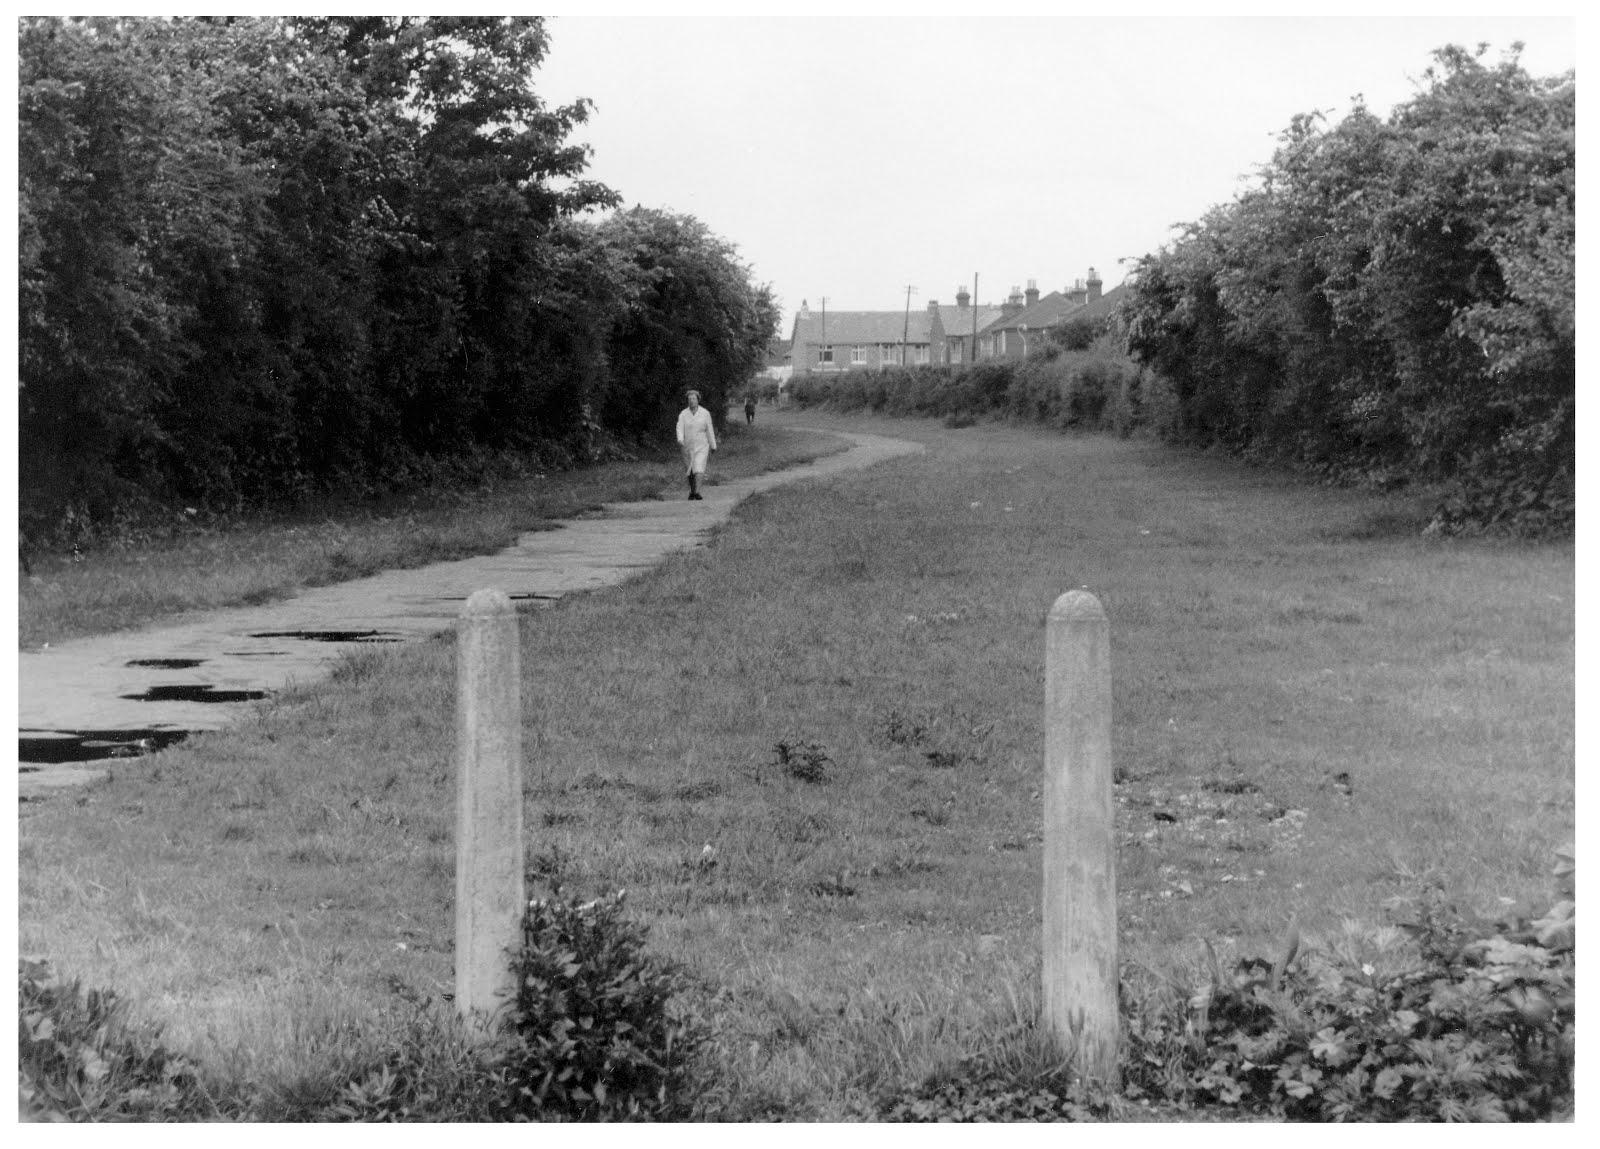 Stokes Bay Line